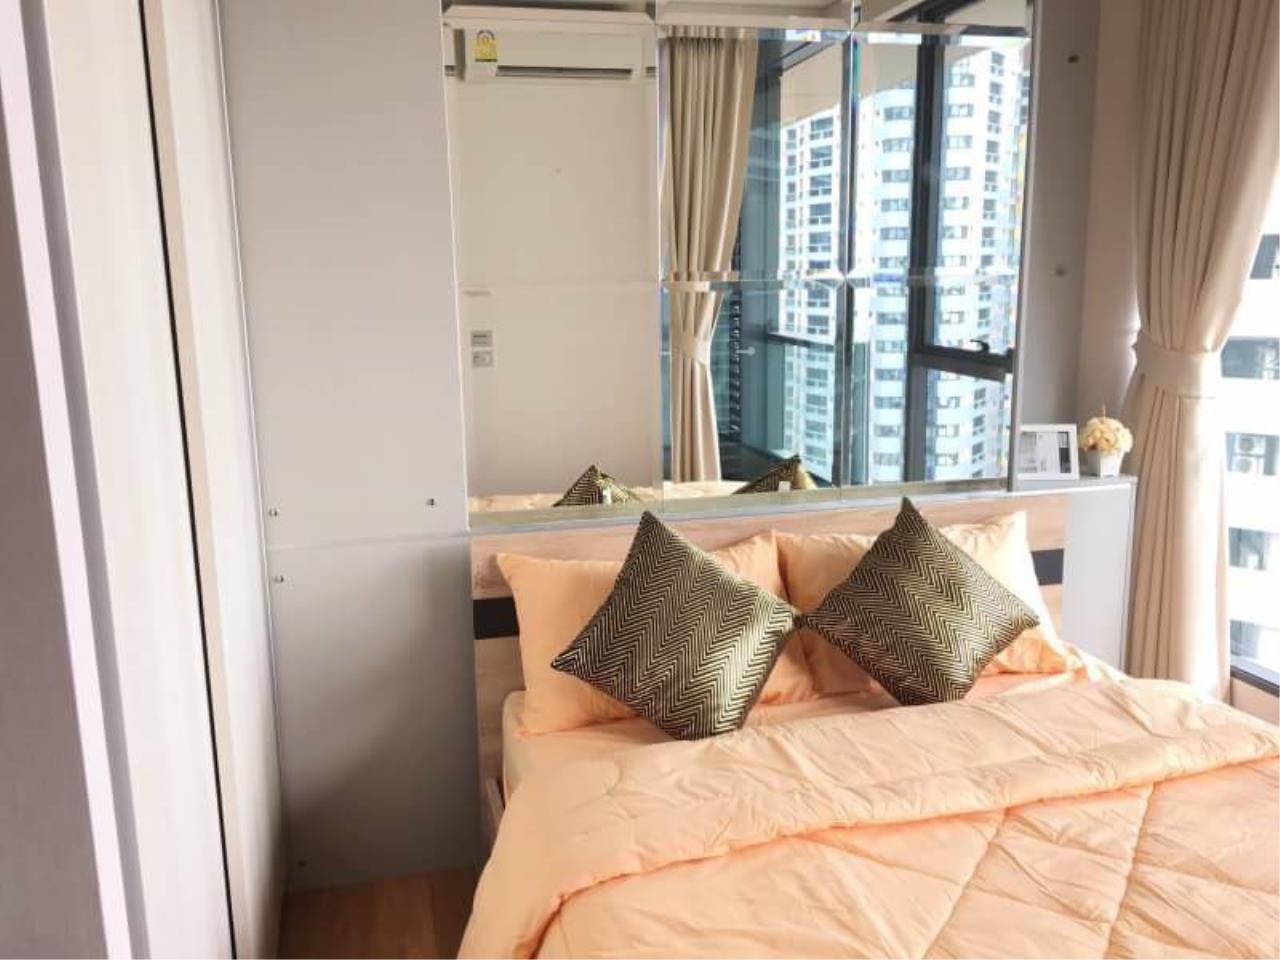 Quality Life Property Agency's S A L E & R E N T !! [ THE LUMPINI 24 ] 1 BR 26.22 Sq.m. Amazing View & Nice Decoration !! 3